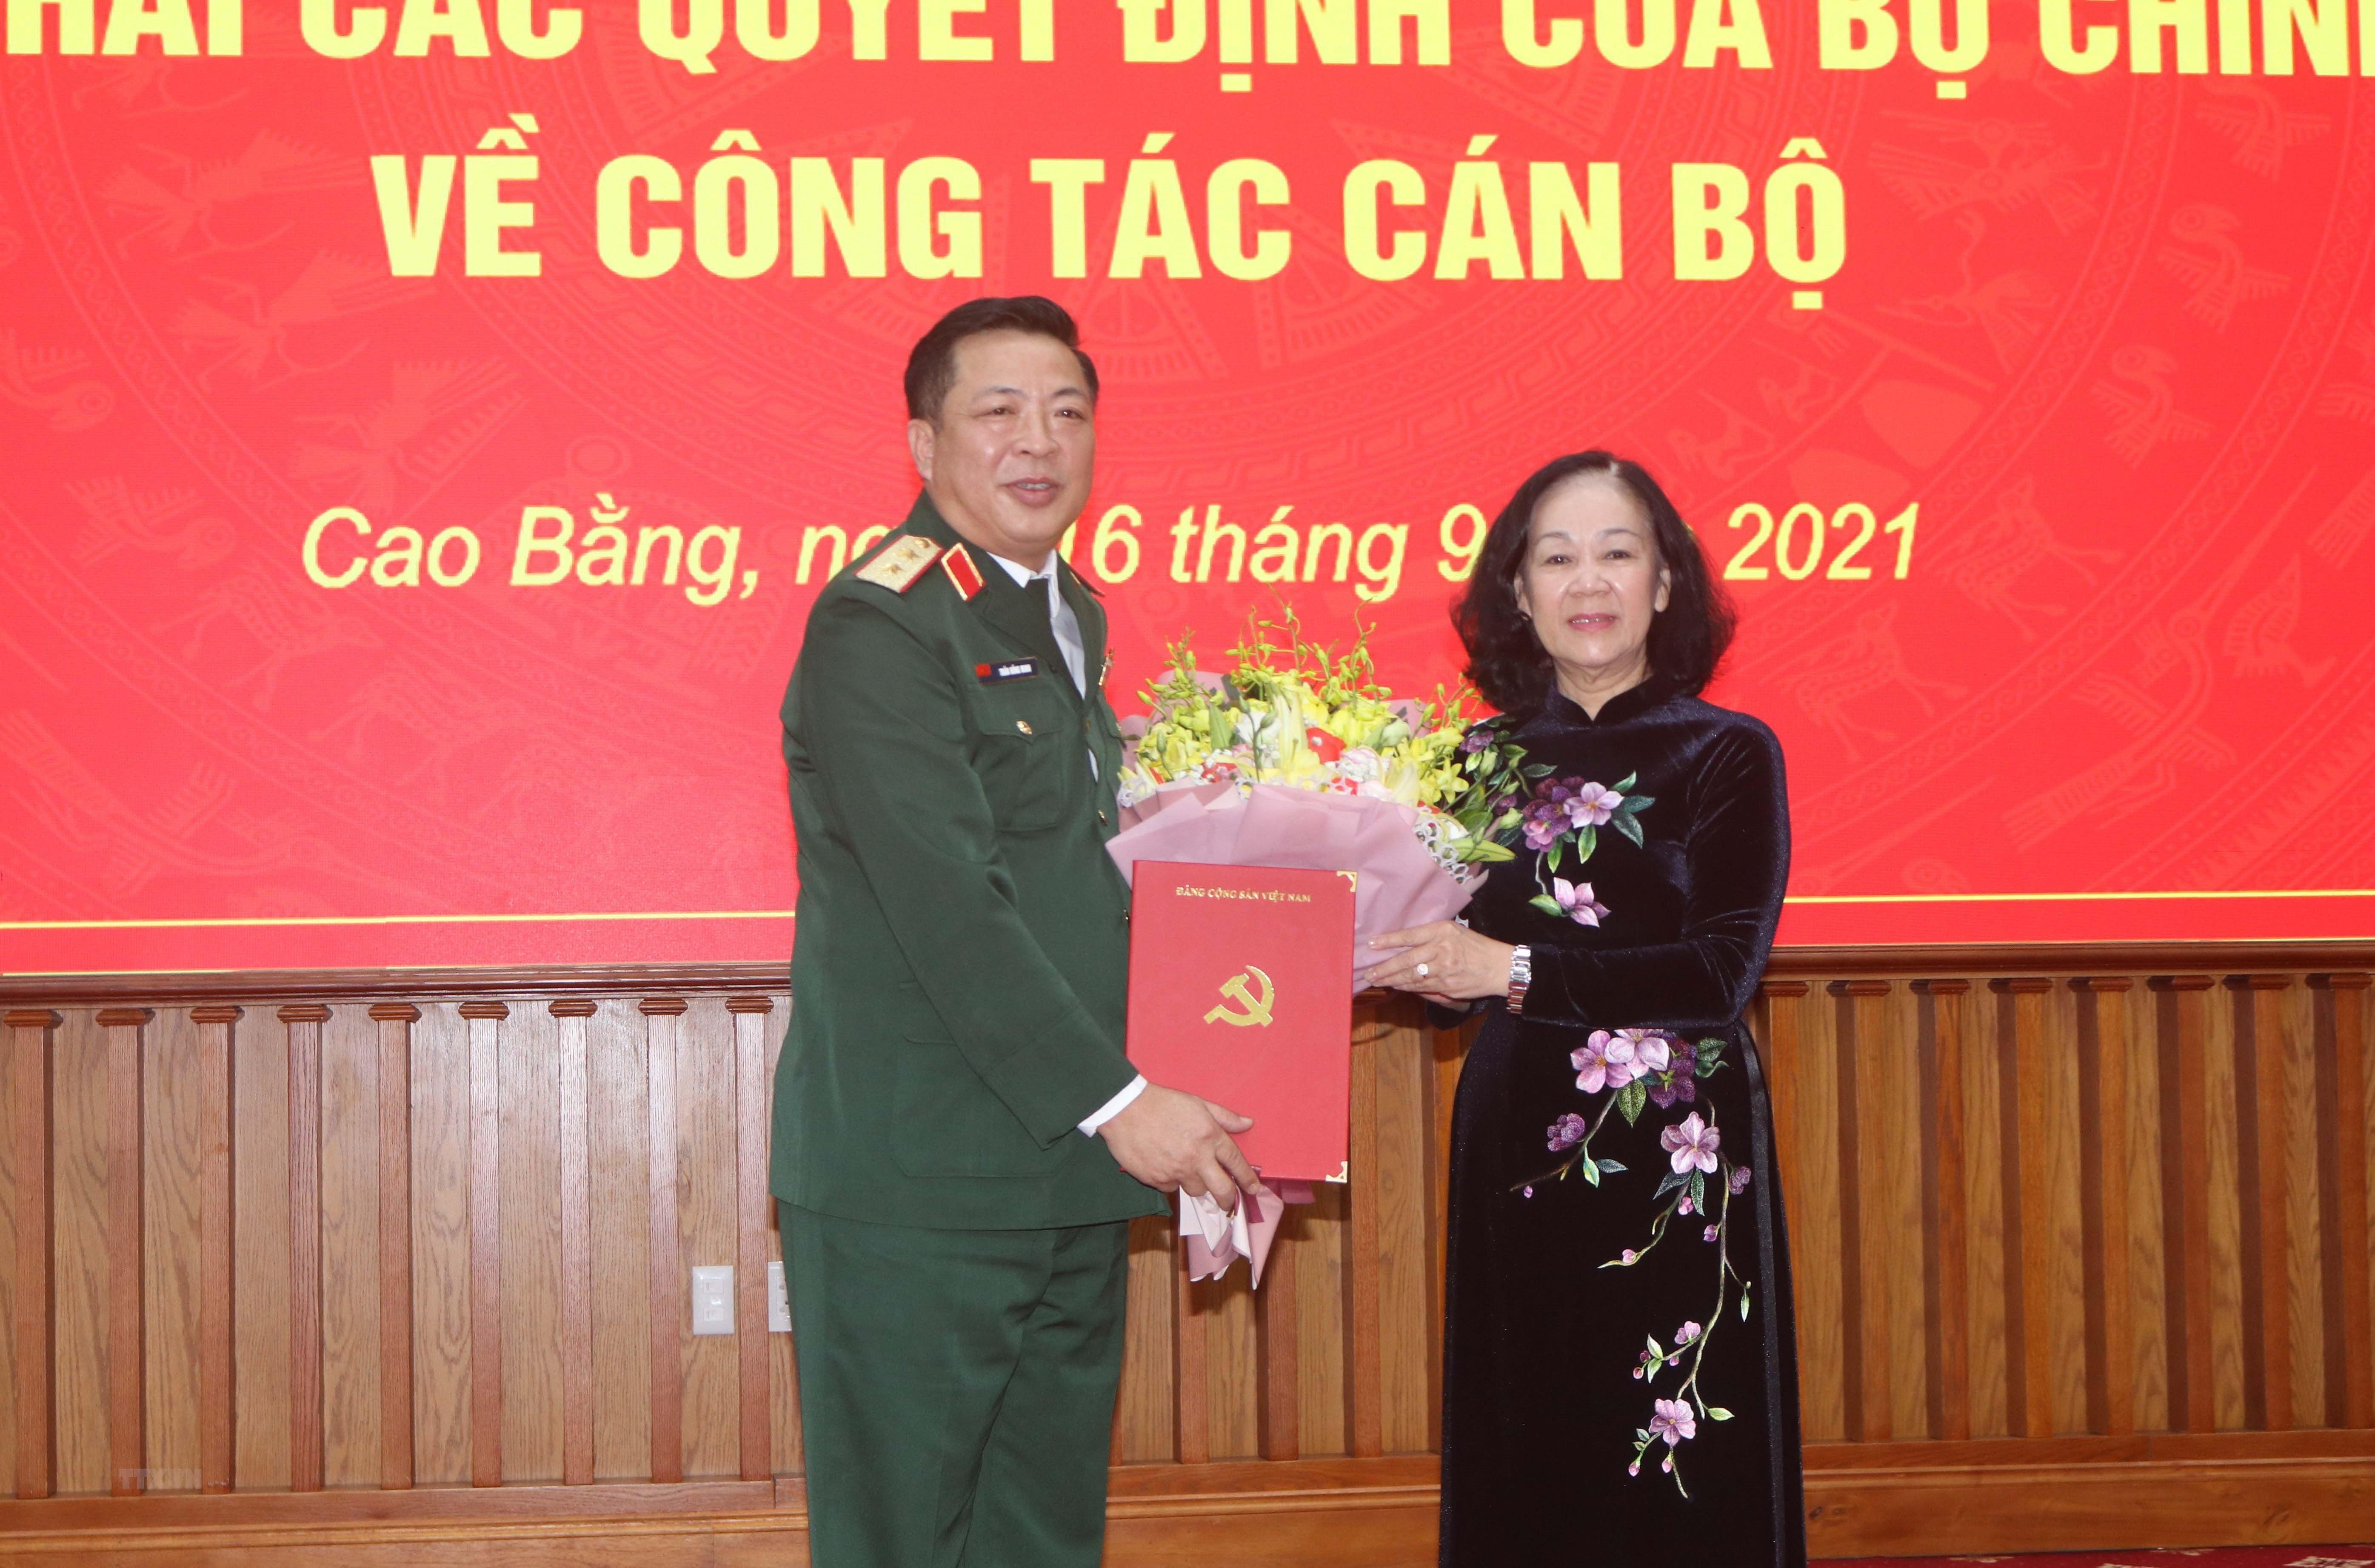 Ong Tran Hong Minh duoc dieu dong lam Bi thu Tinh uy Cao Bang hinh anh 1